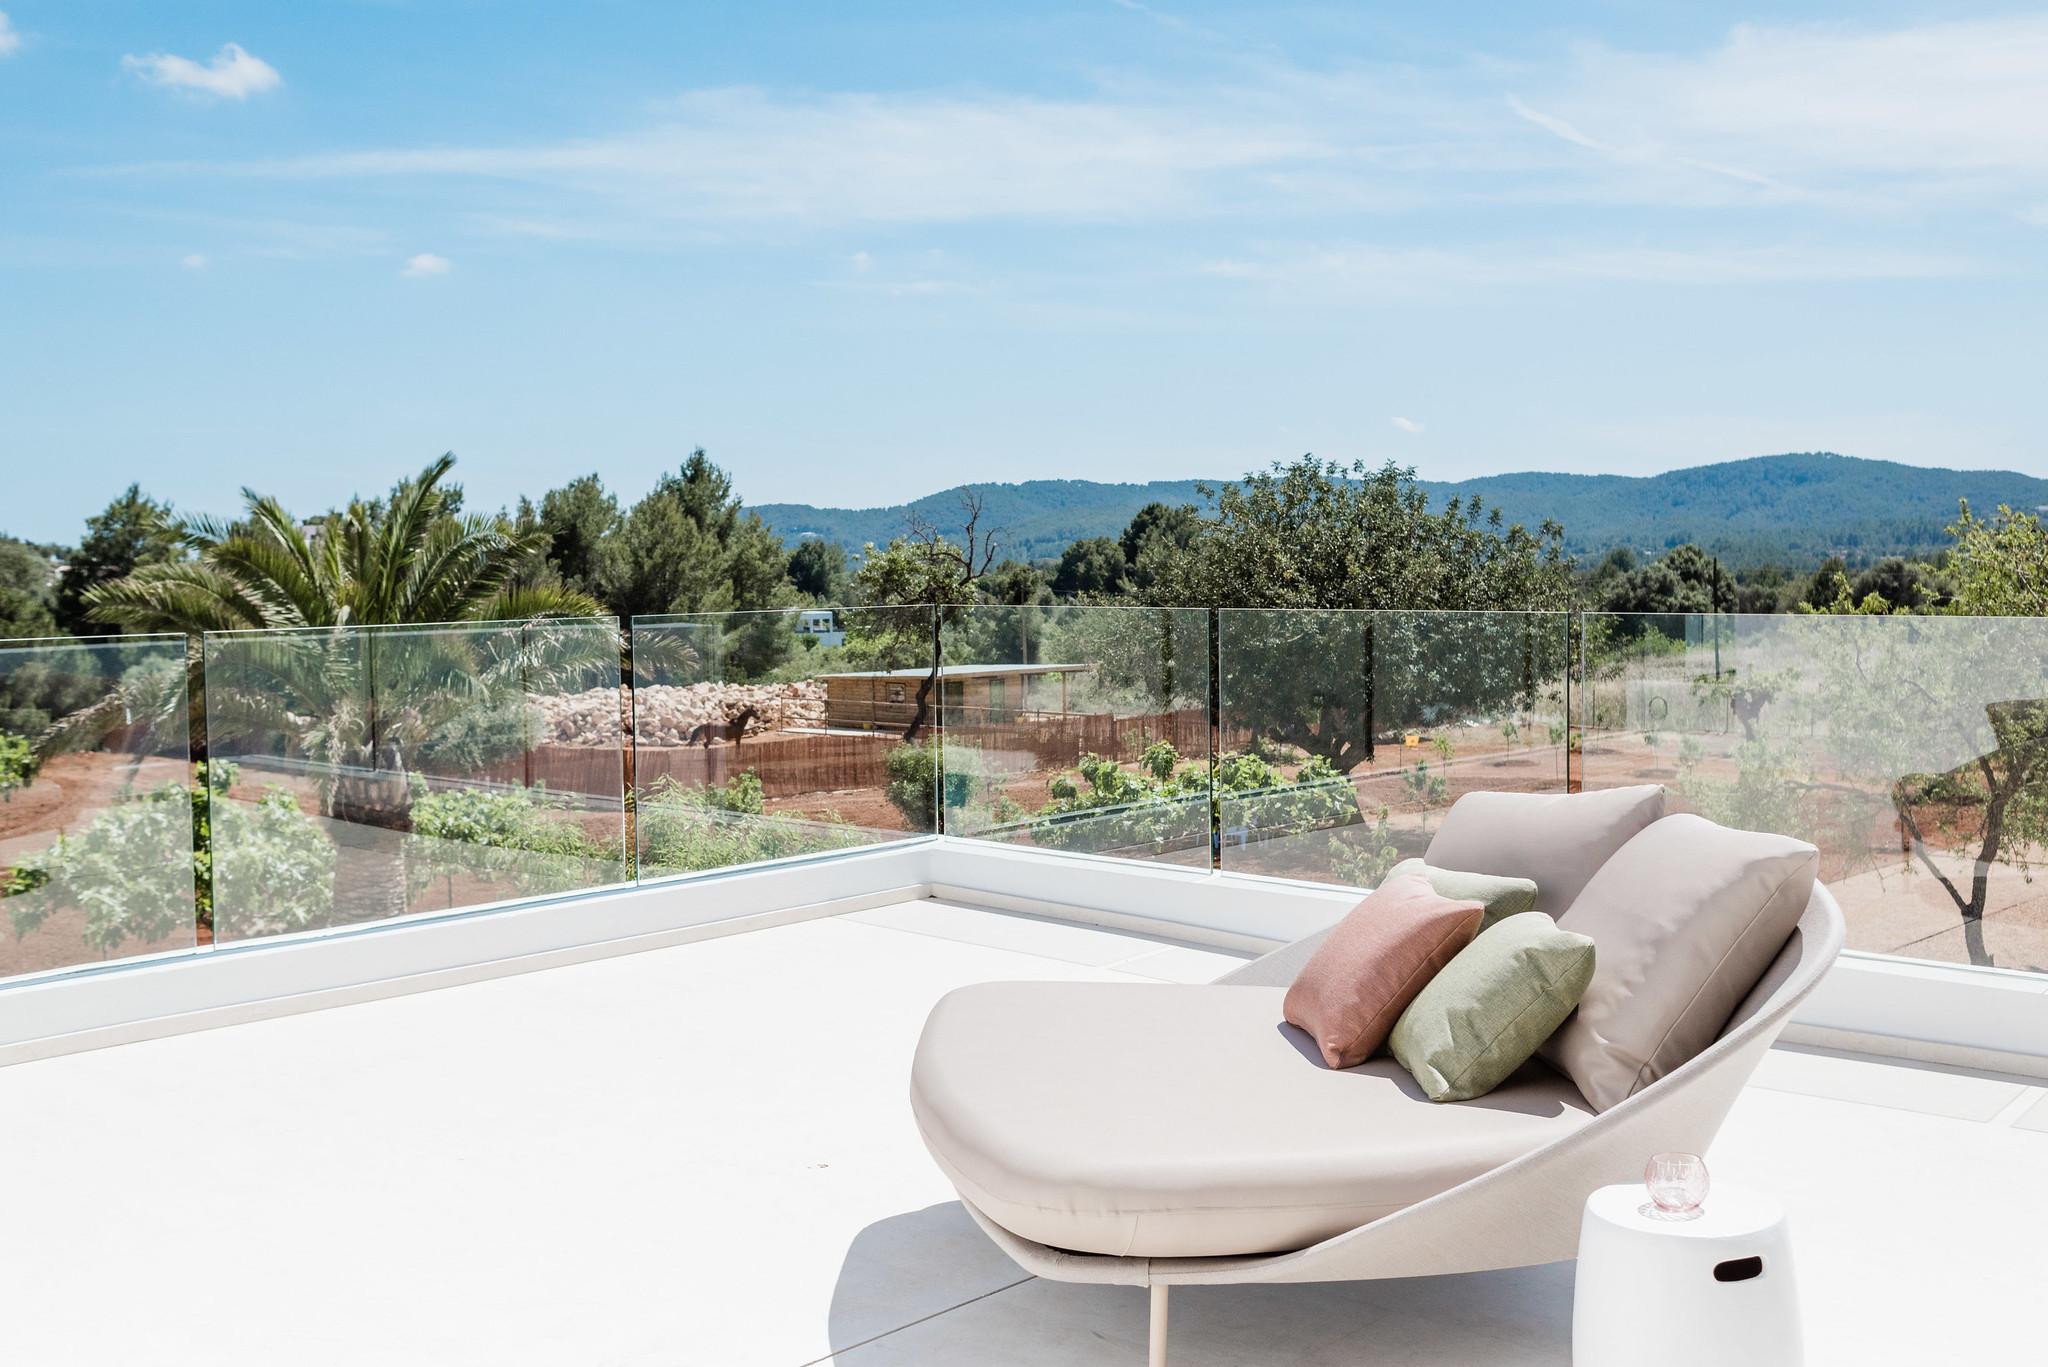 https://www.white-ibiza.com/wp-content/uploads/2020/06/white-ibiza-villas-can-carmen-exterior-master-terrace.jpg